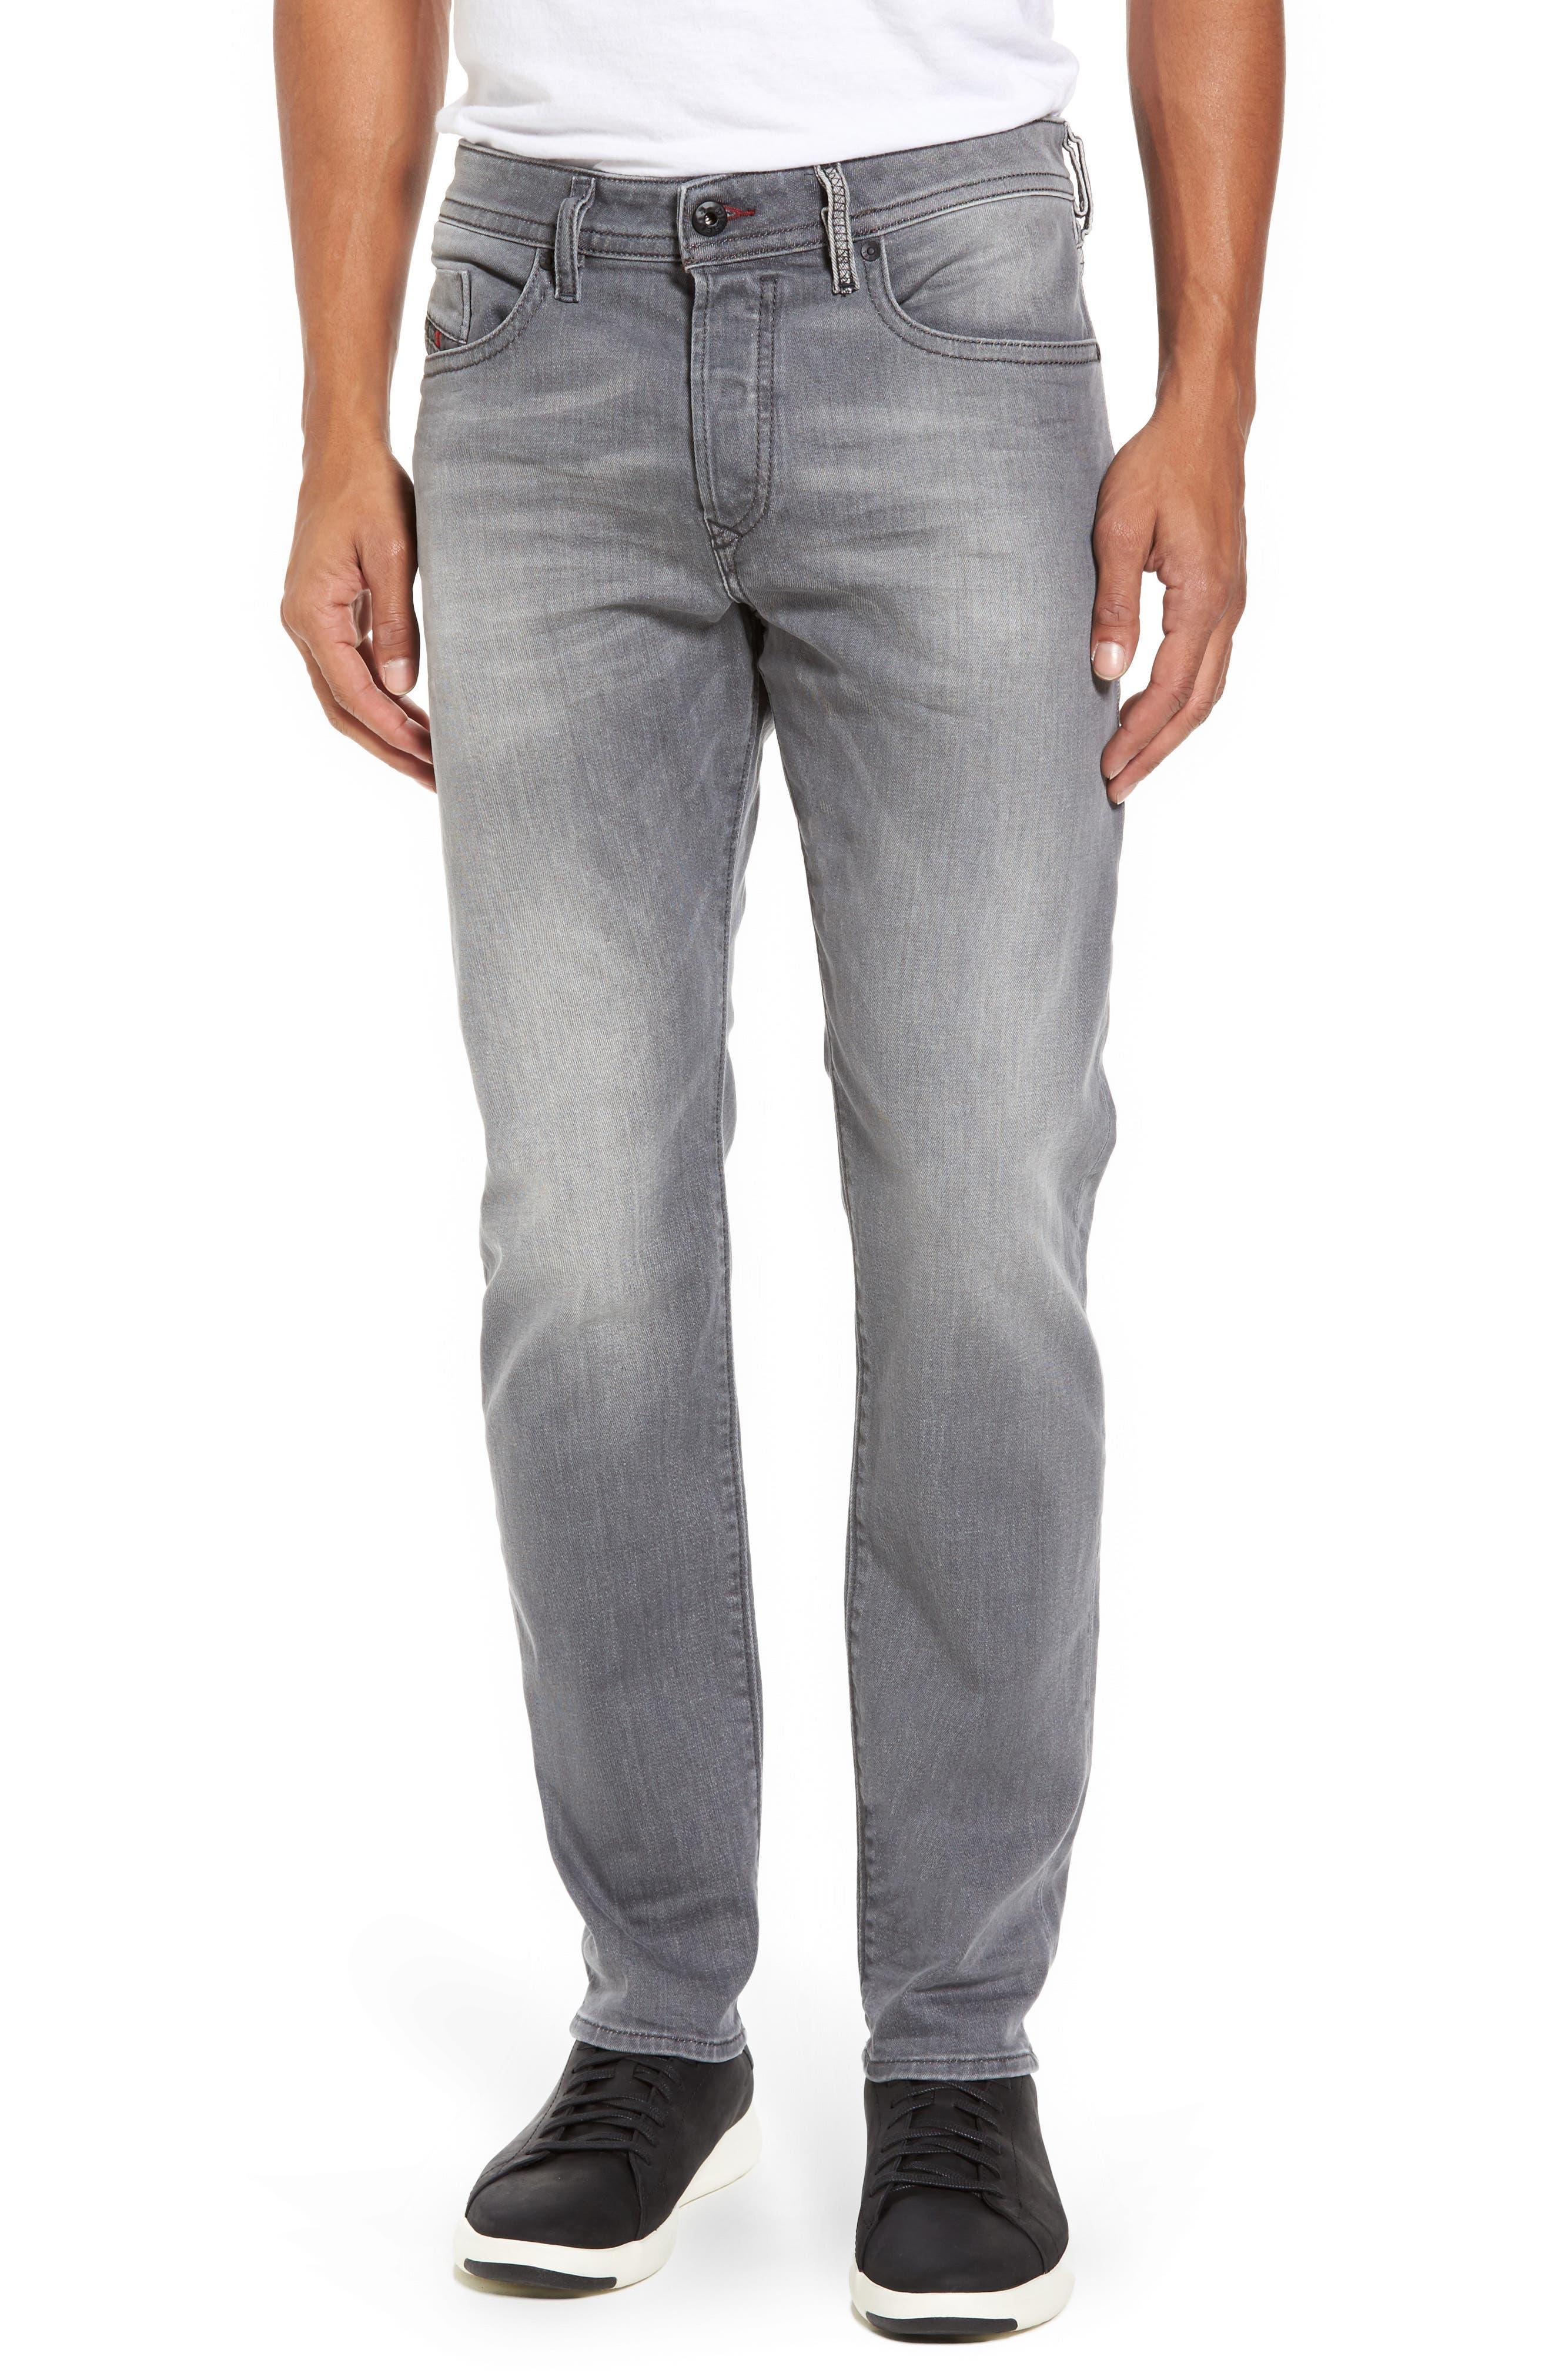 Buster Slim Straight Leg Jeans,                             Main thumbnail 1, color,                             020